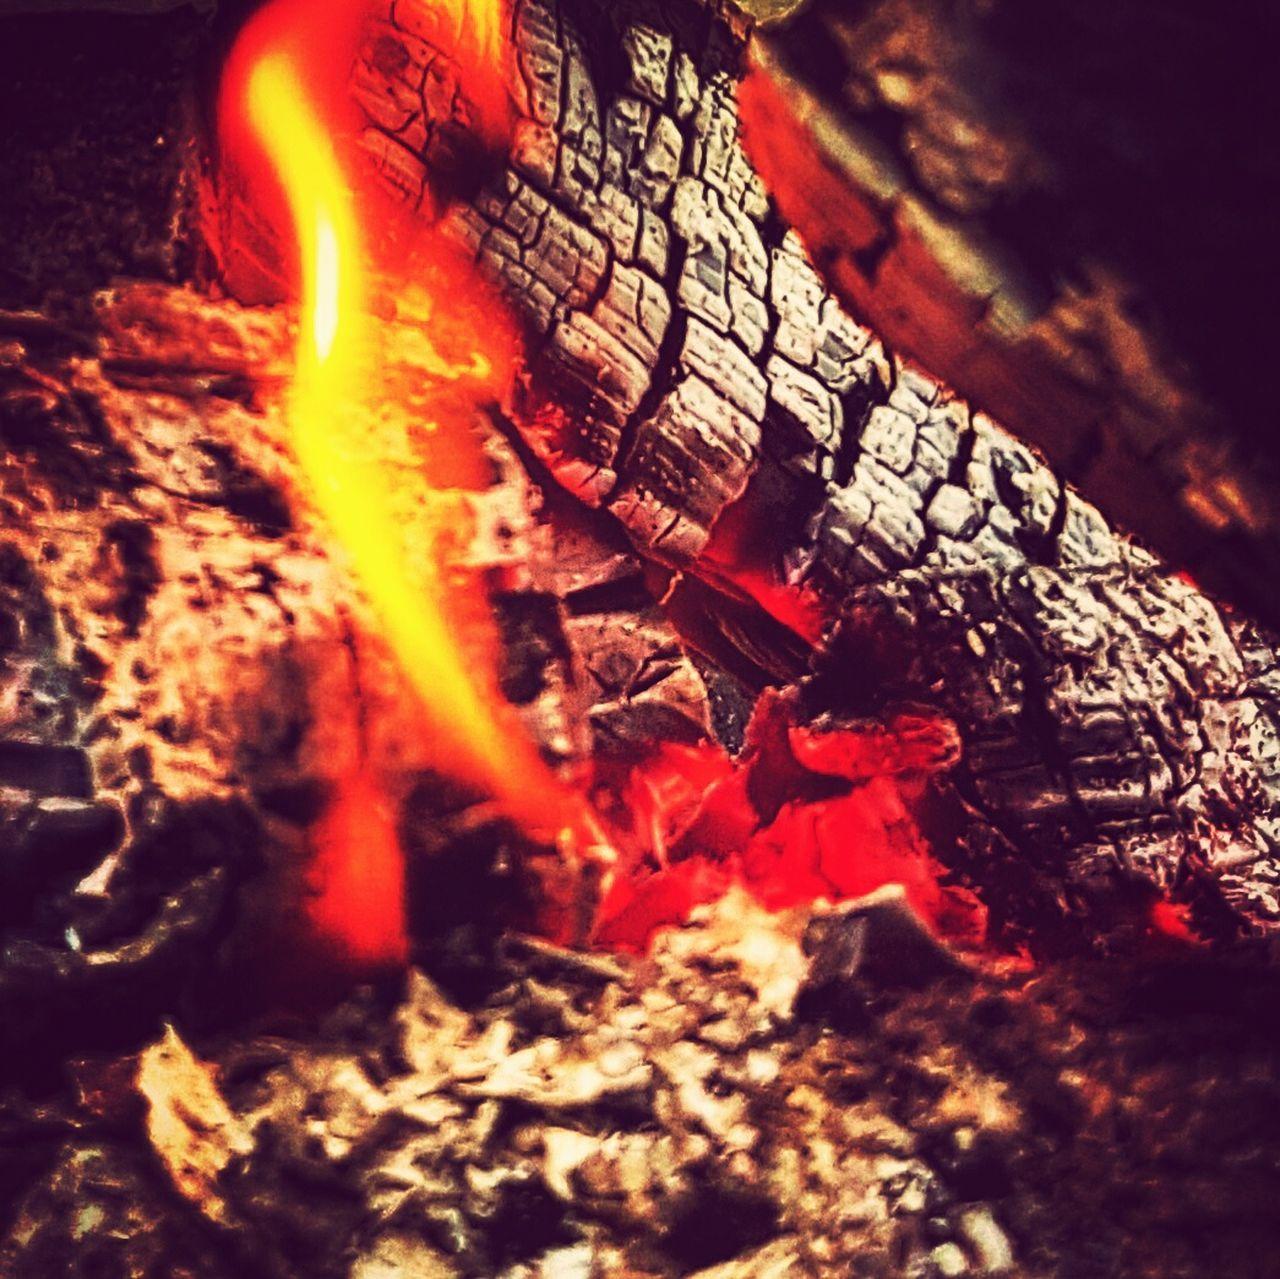 Relaxing fire